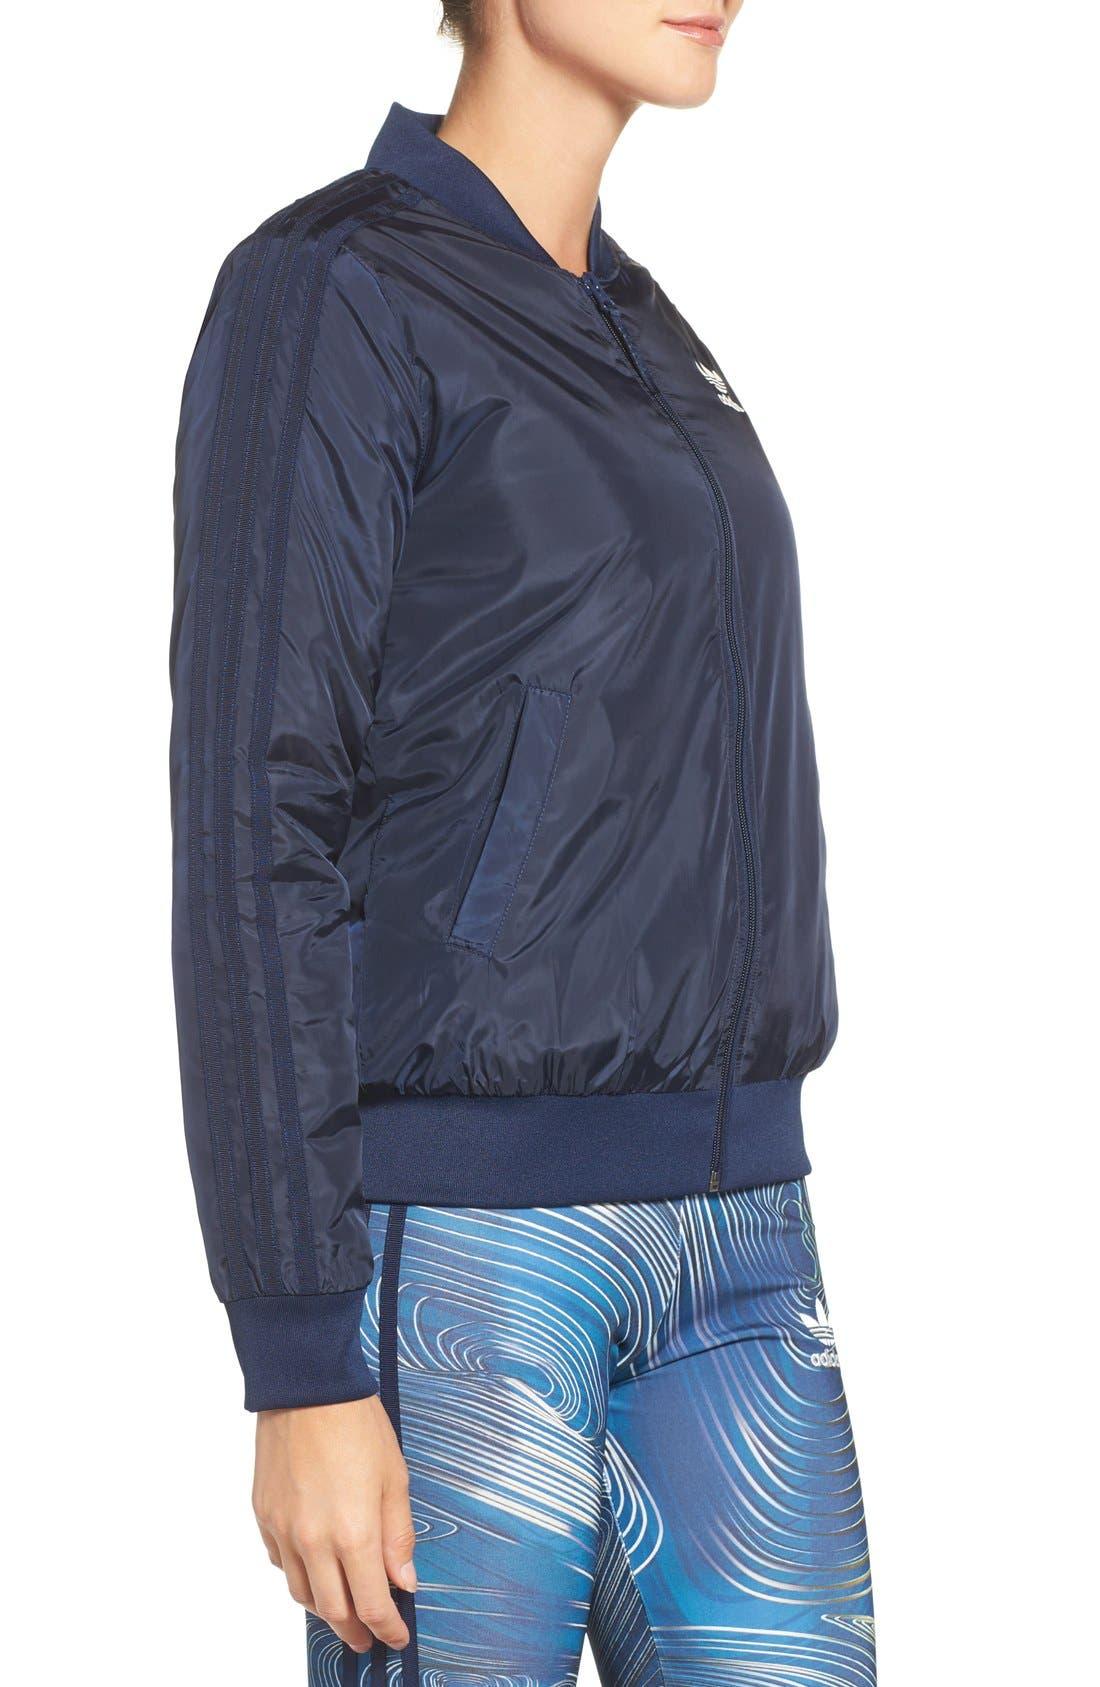 Alternate Image 3  - adidas Originals 'BG' 3-Stripes Bomber Jacket